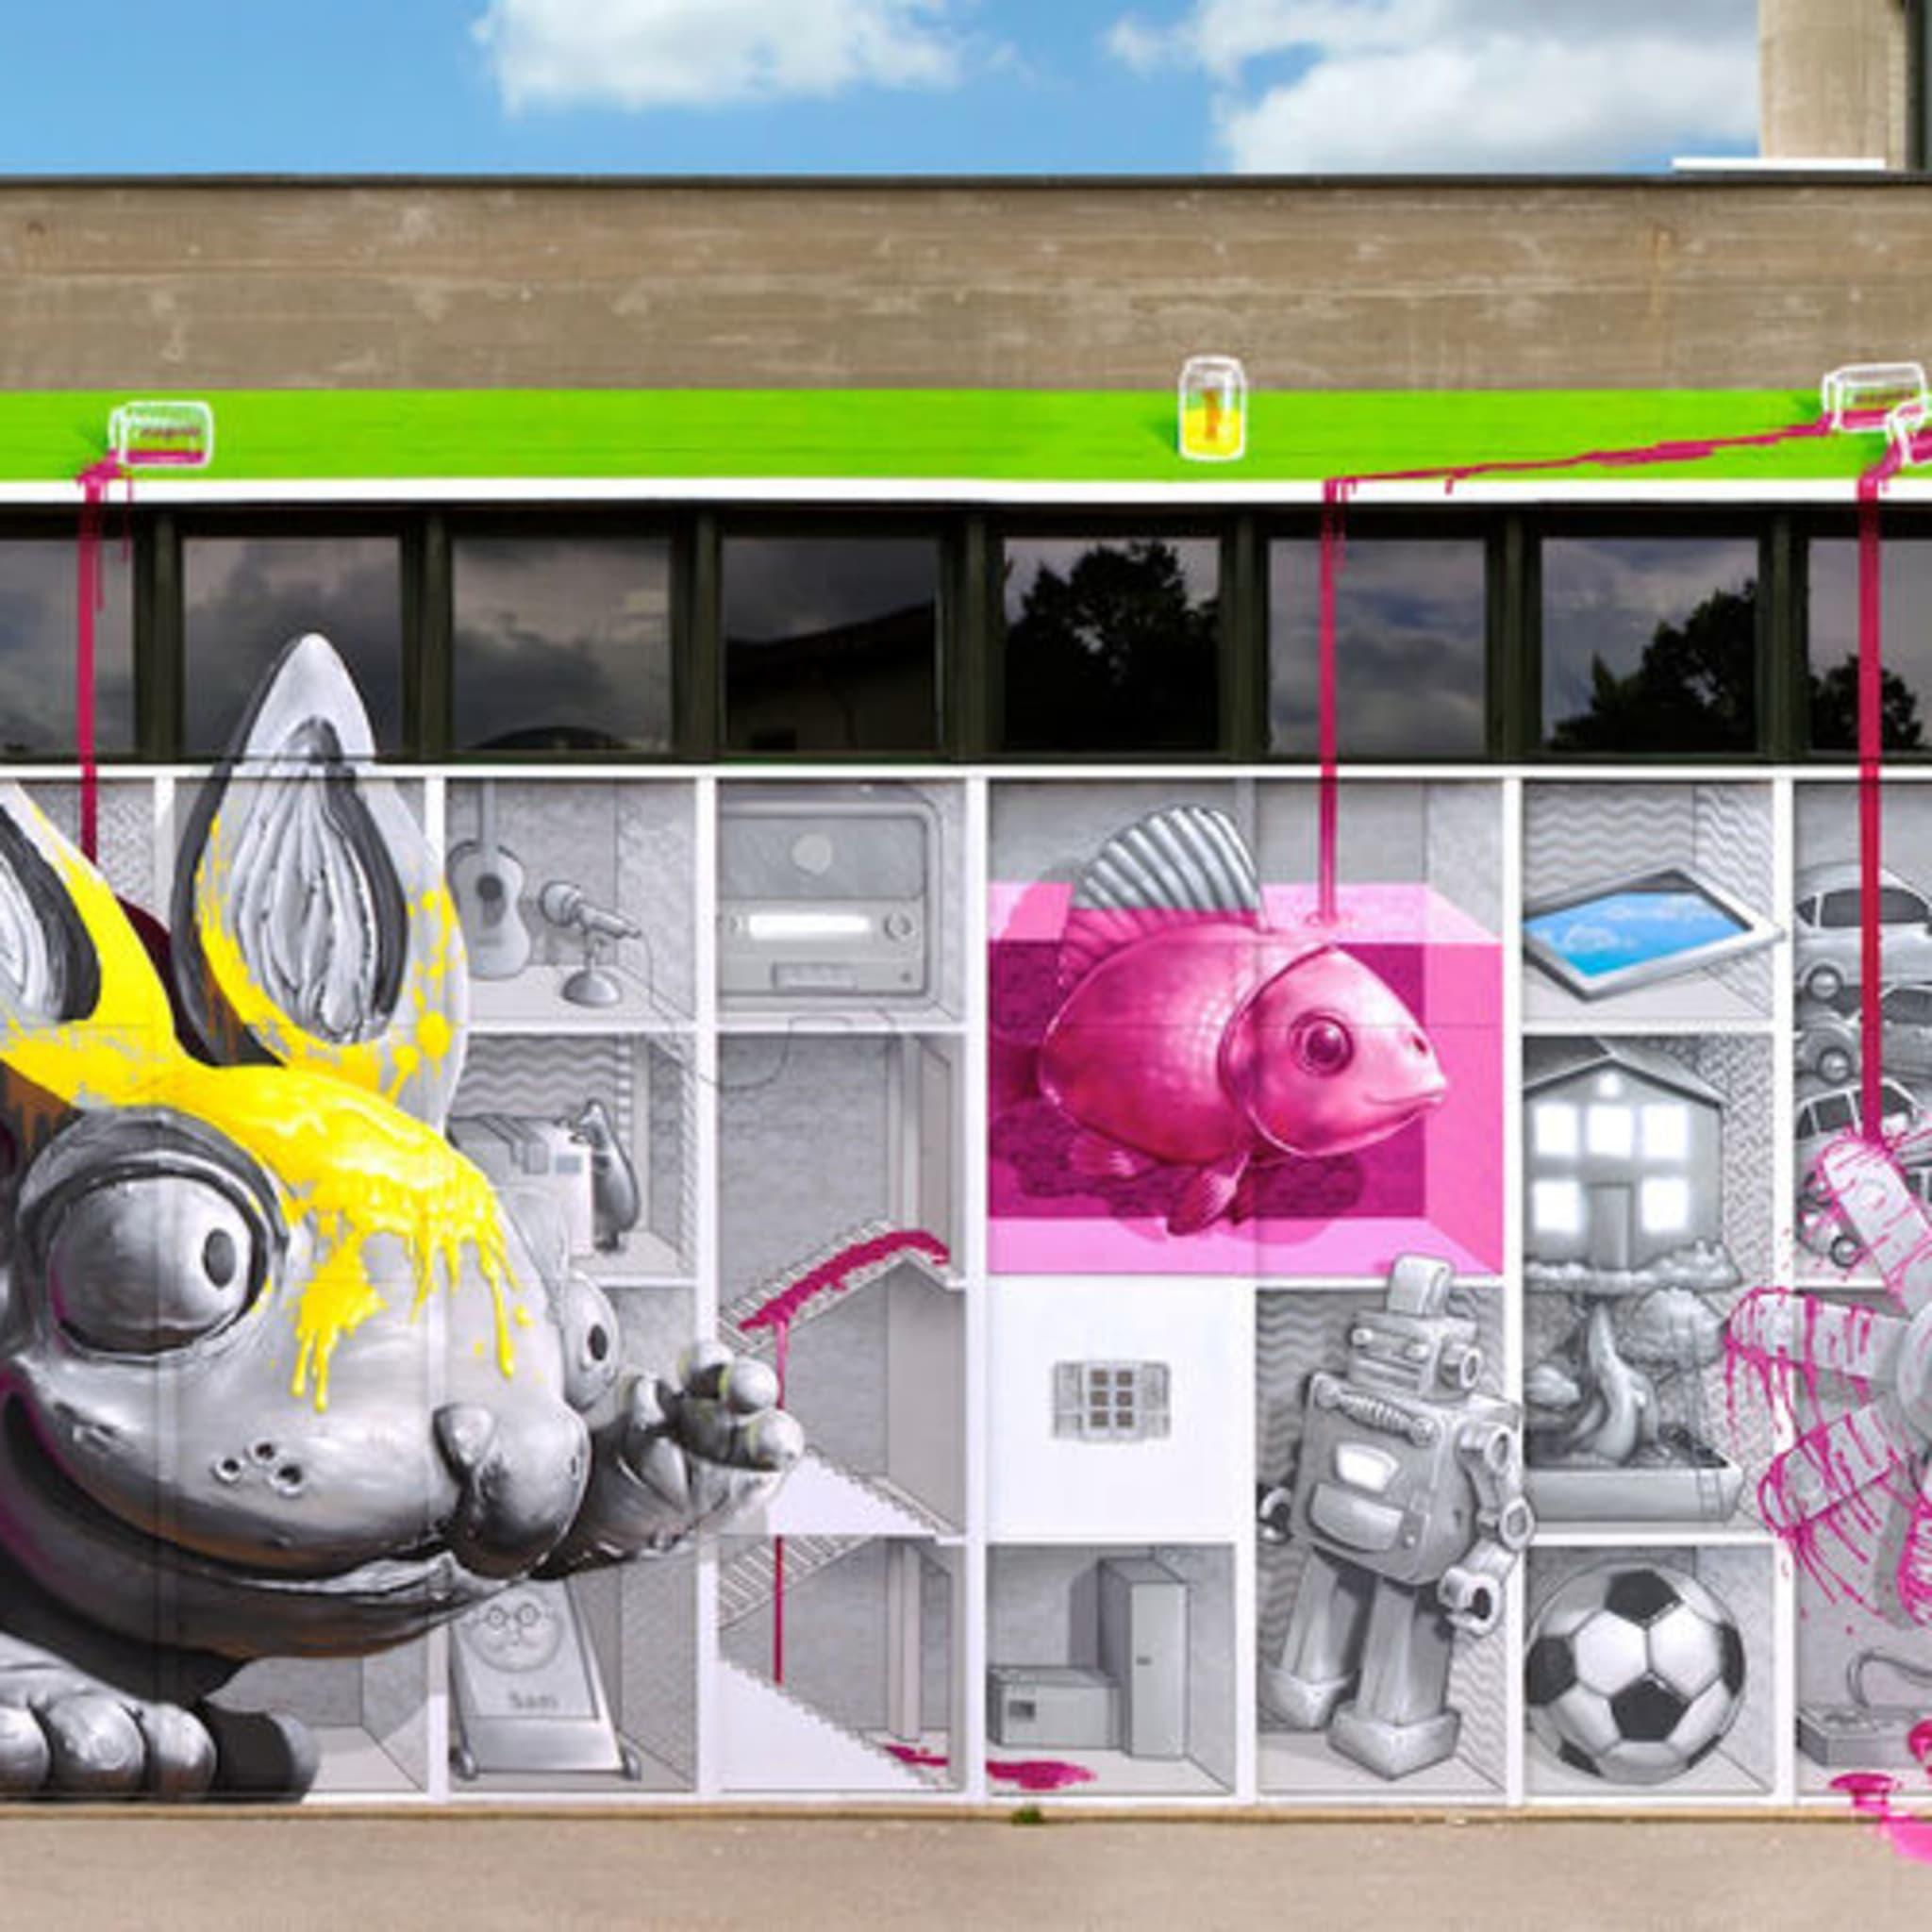 Artwork By NEVERCREW in Lugano